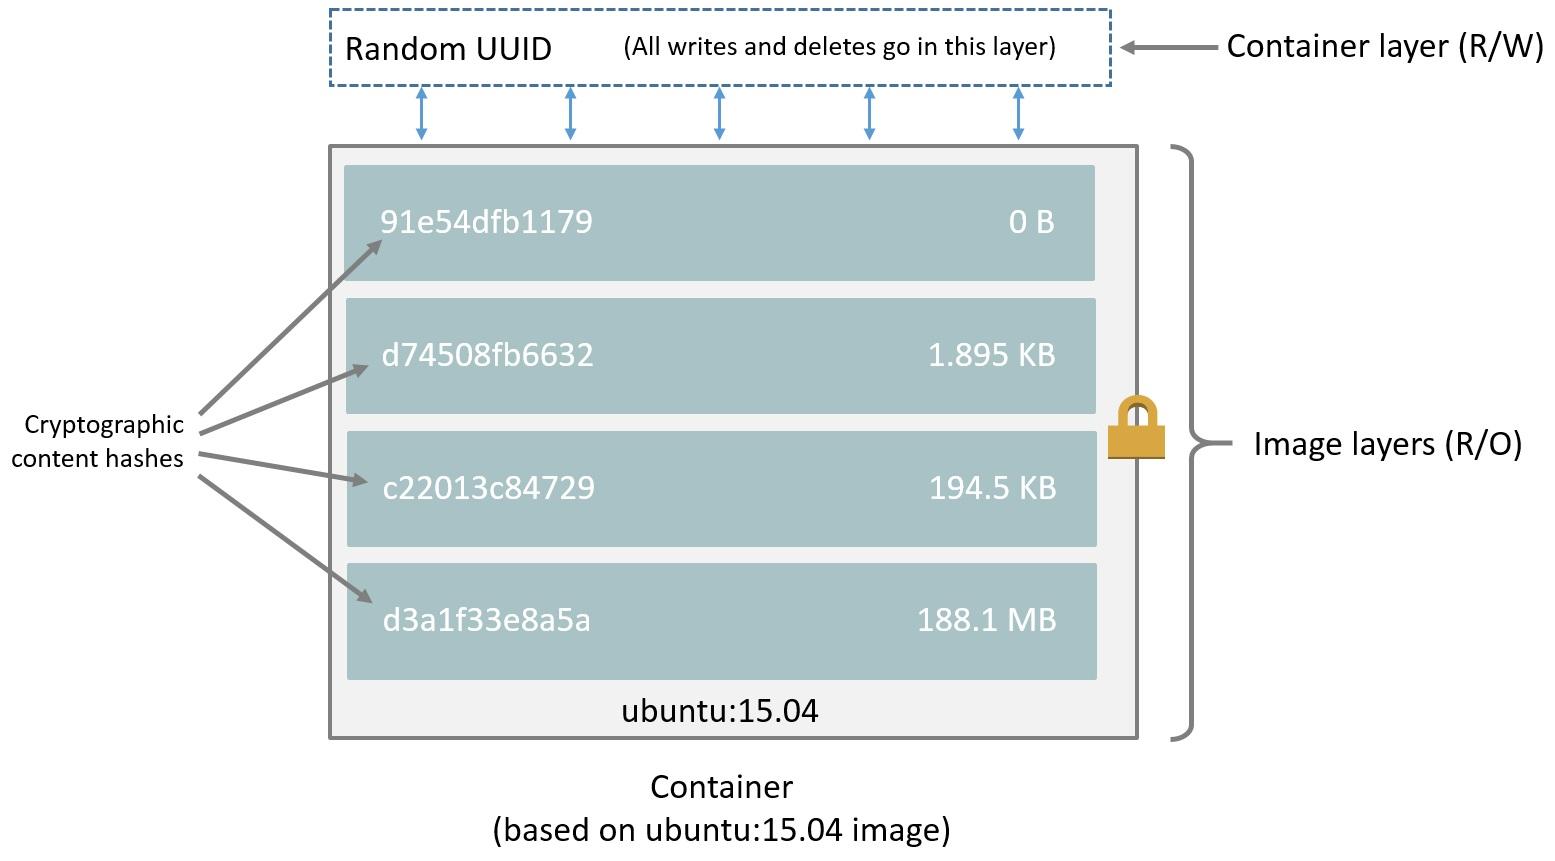 Imagesandcontainers - test_dockerrr